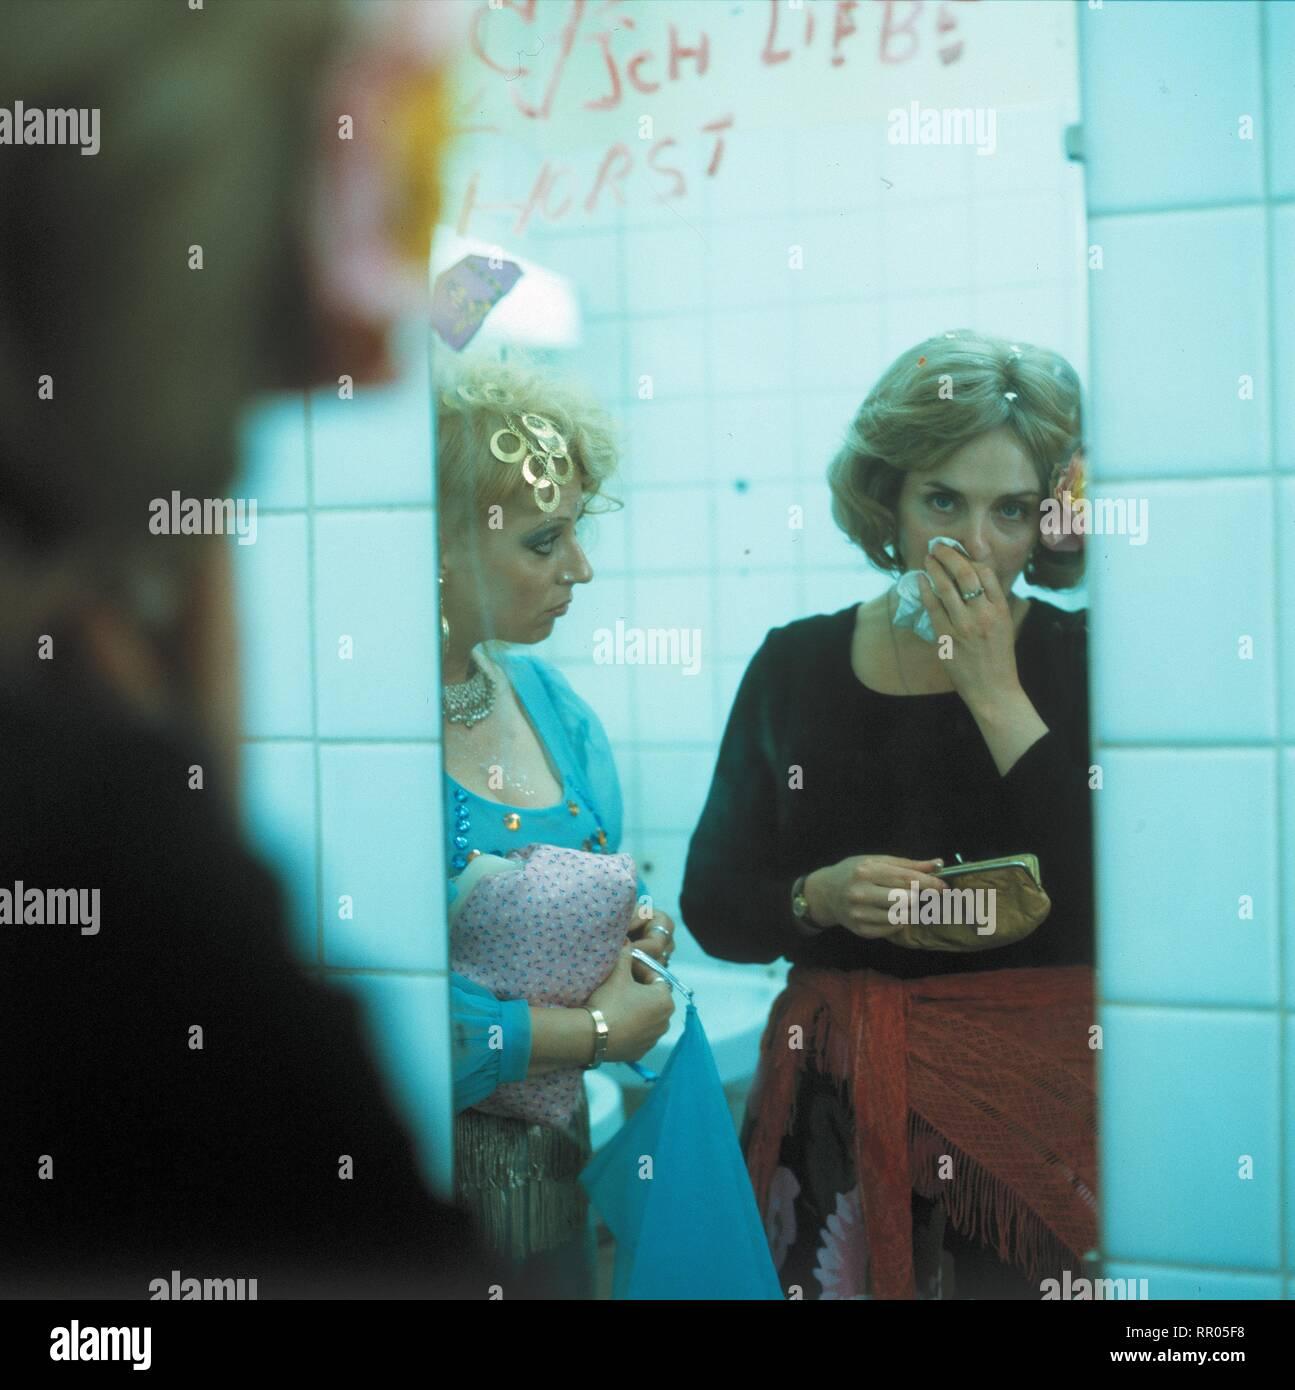 KEHRAUS / BRD 1983 / Hanns Christian Müller Szene mit VERONIKA FABER und GISELA SCHNEEBERGER. 32097# / Überschrift: KEHRAUS / BRD 1983 Immagini Stock